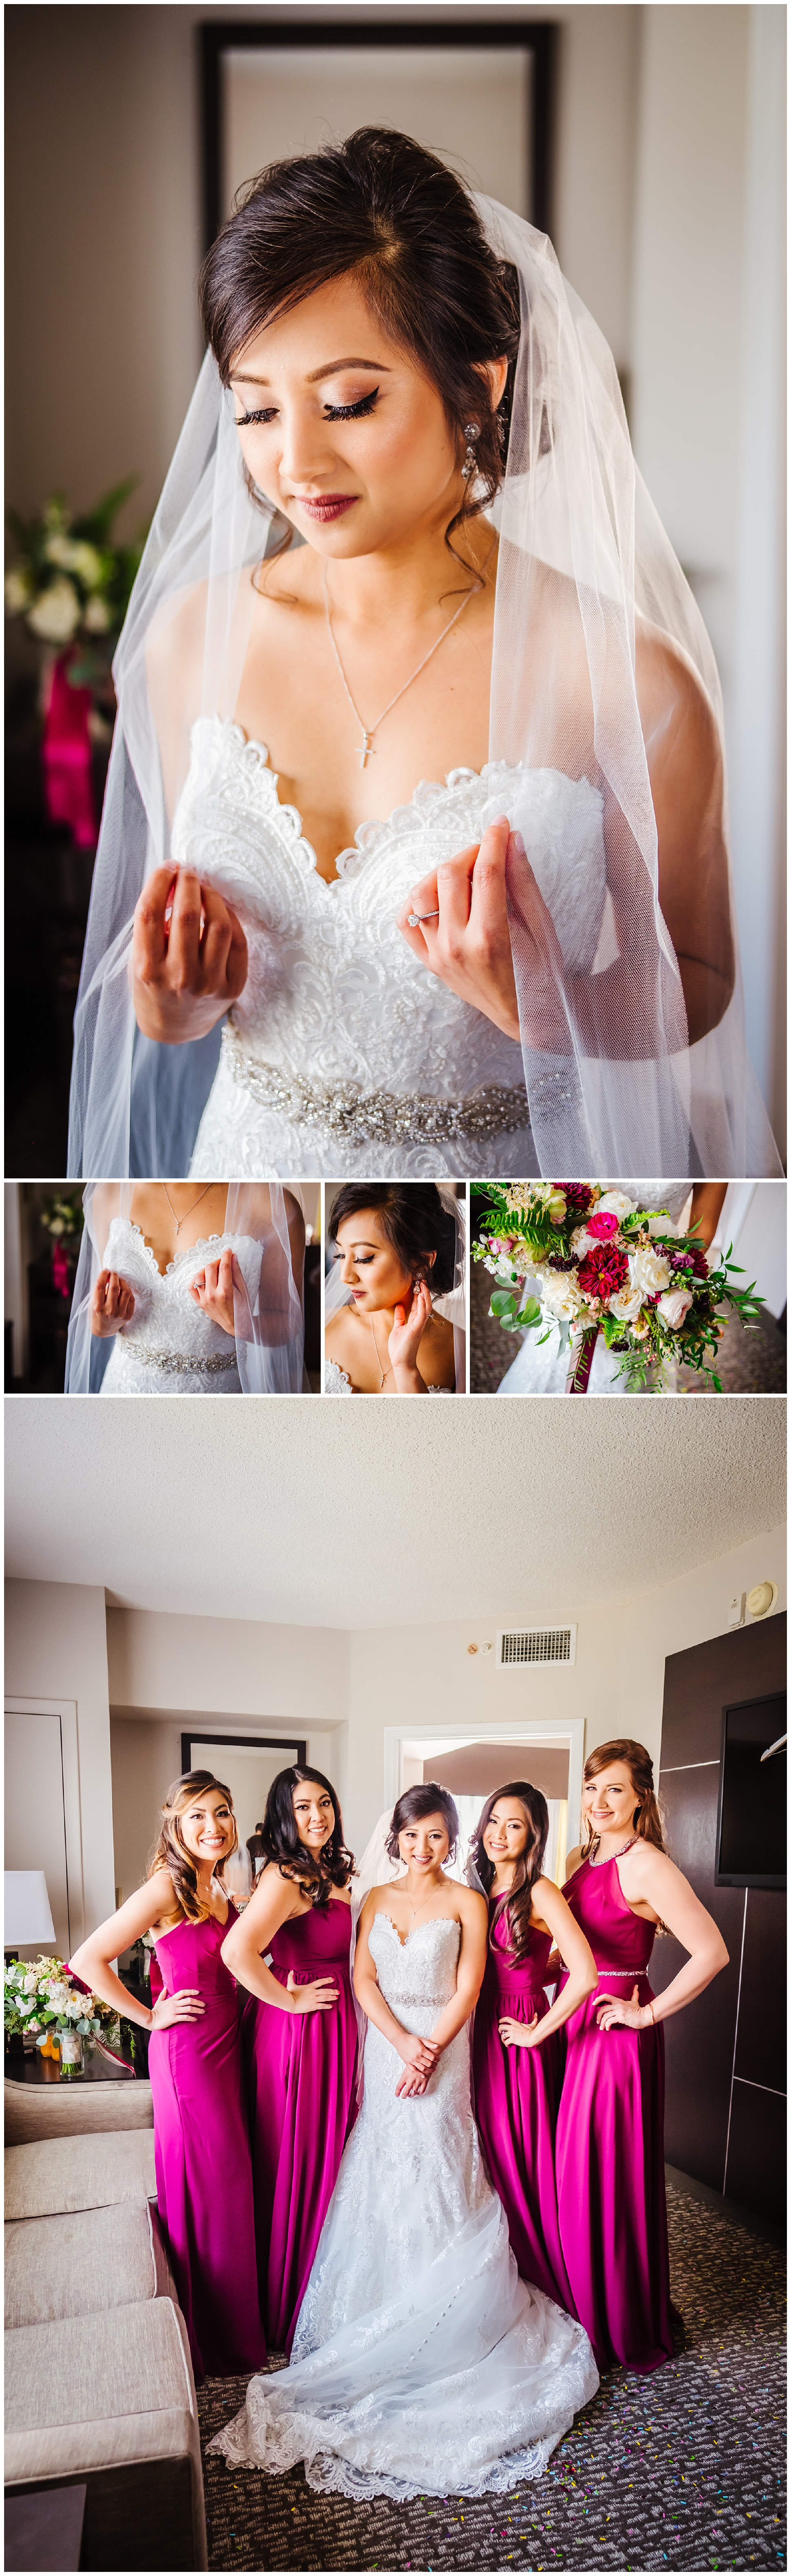 tampa-wedding-photographer-philipino-colorful-woods-ballroom-church-mass-confetti-fuscia_0016.jpg